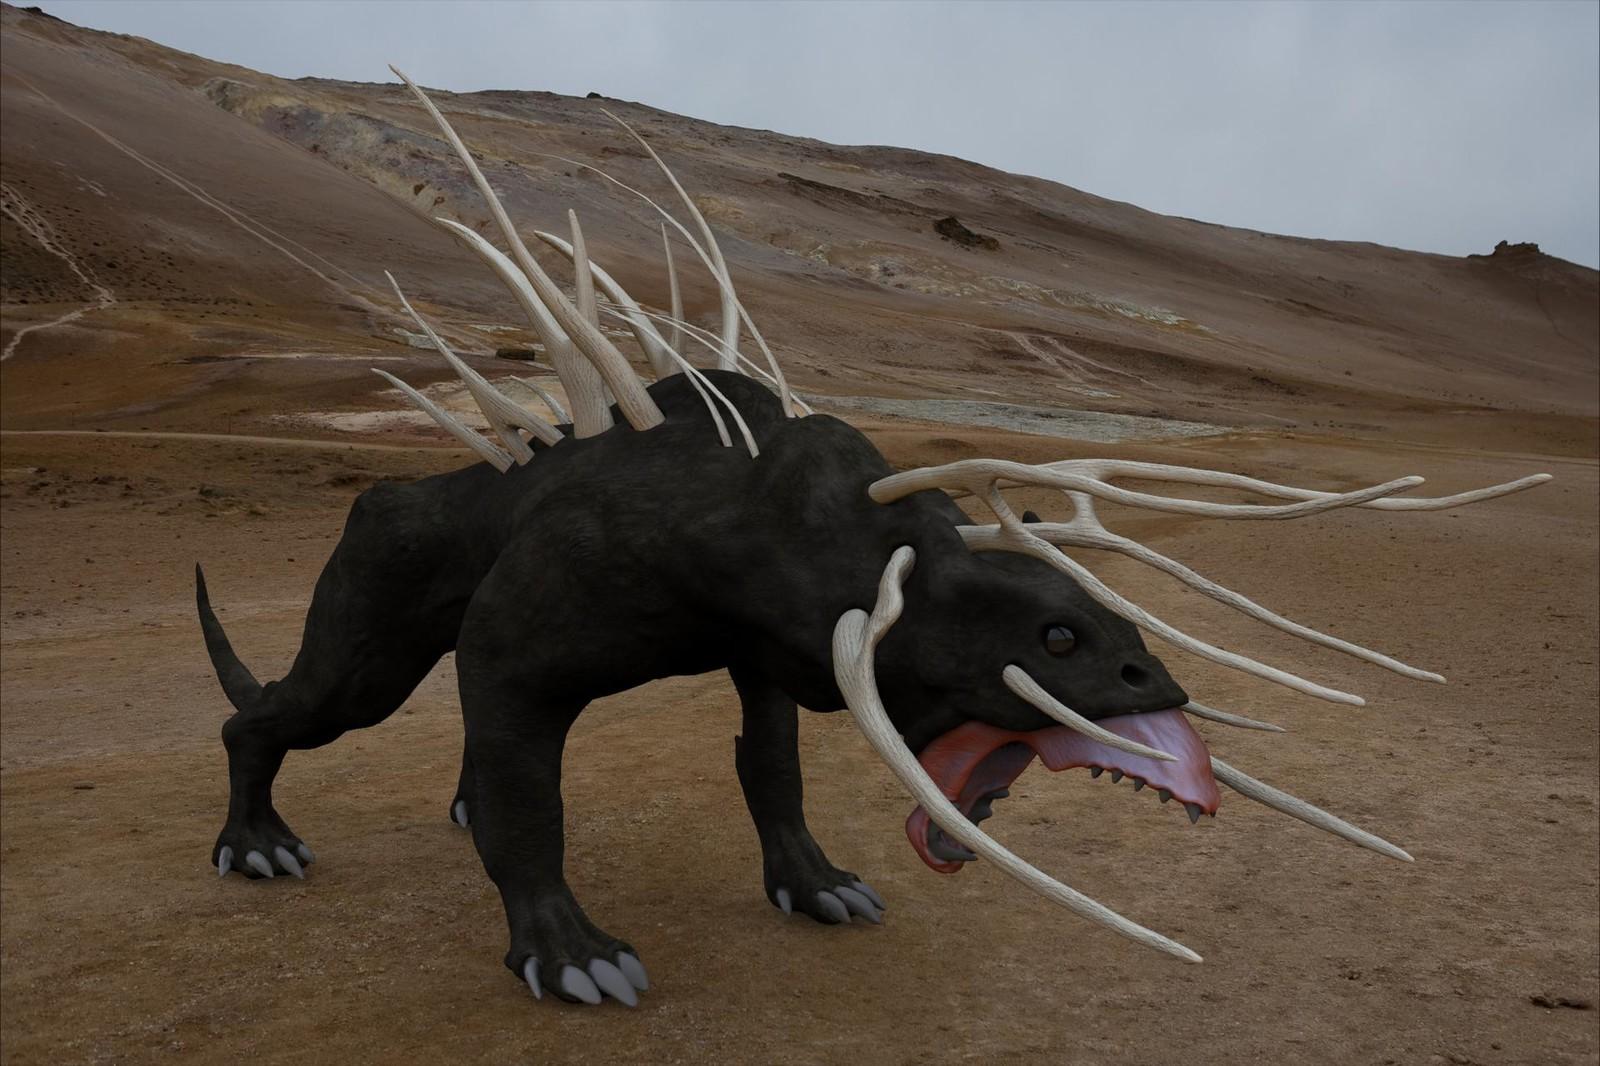 Predator Hell hound